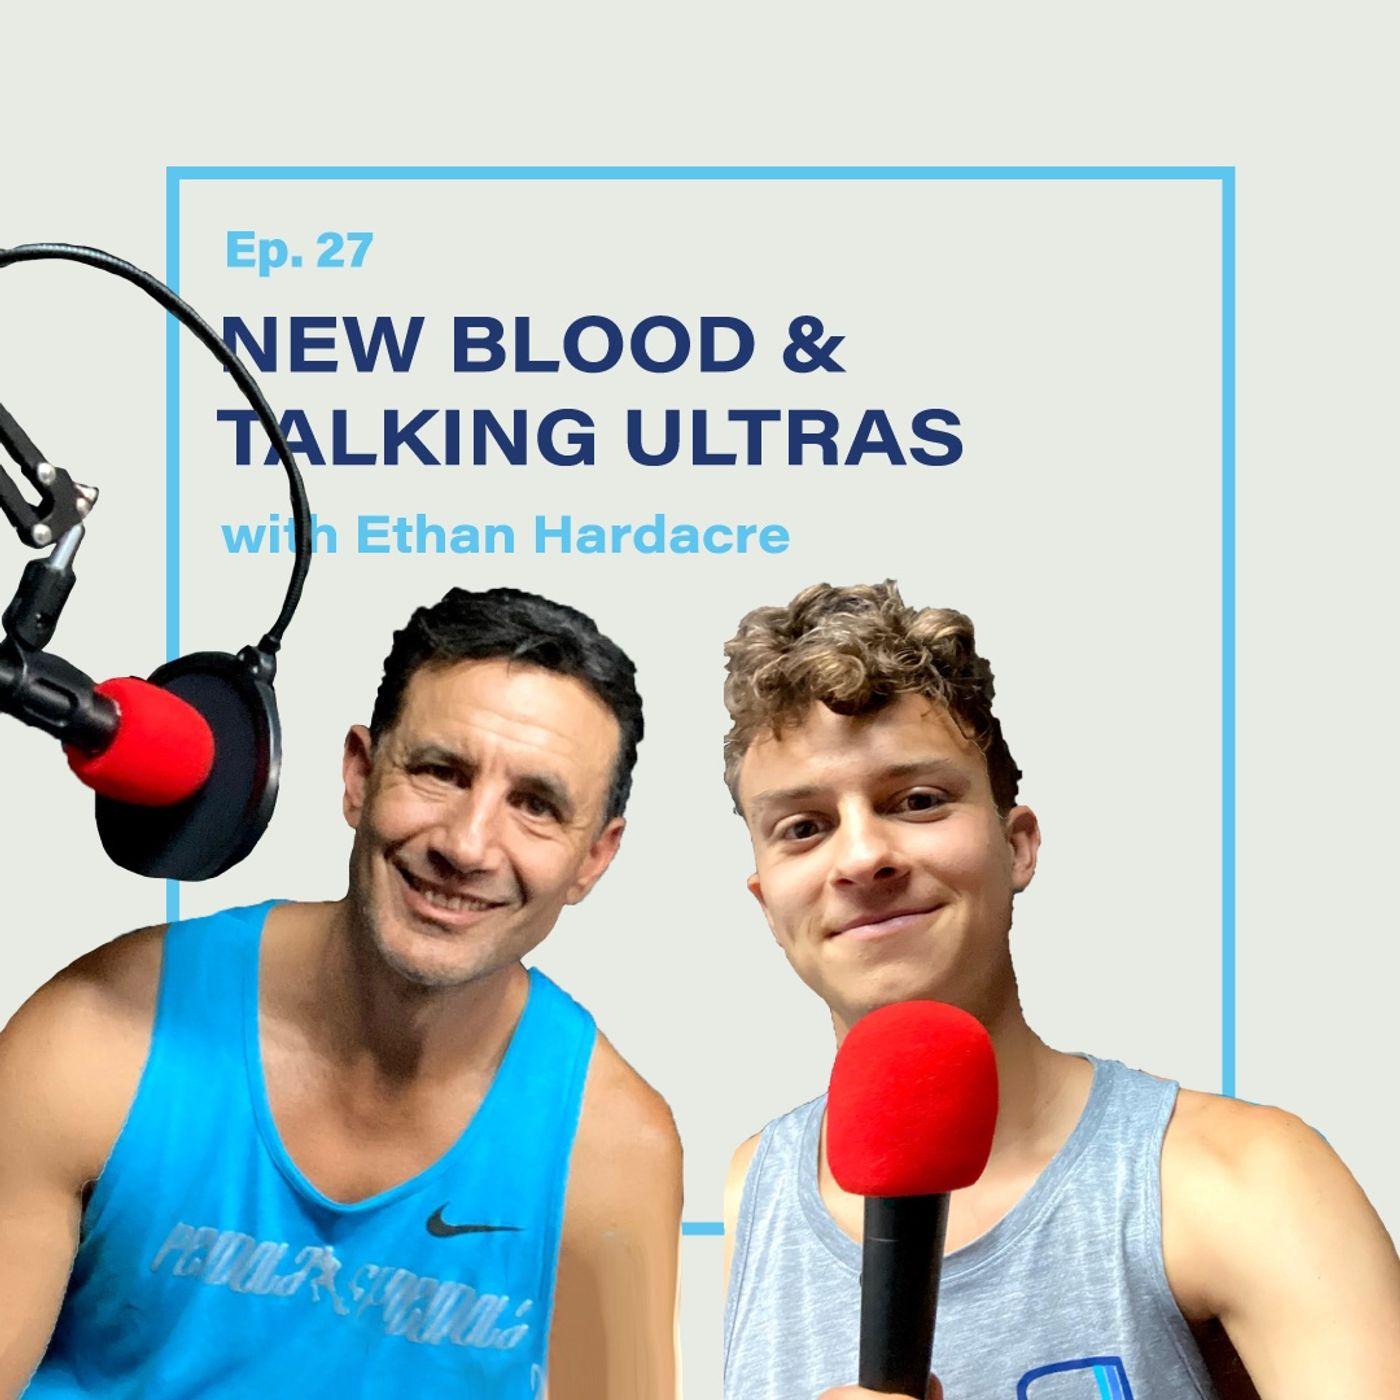 R3-27 New Blood: Ethan Hardacre